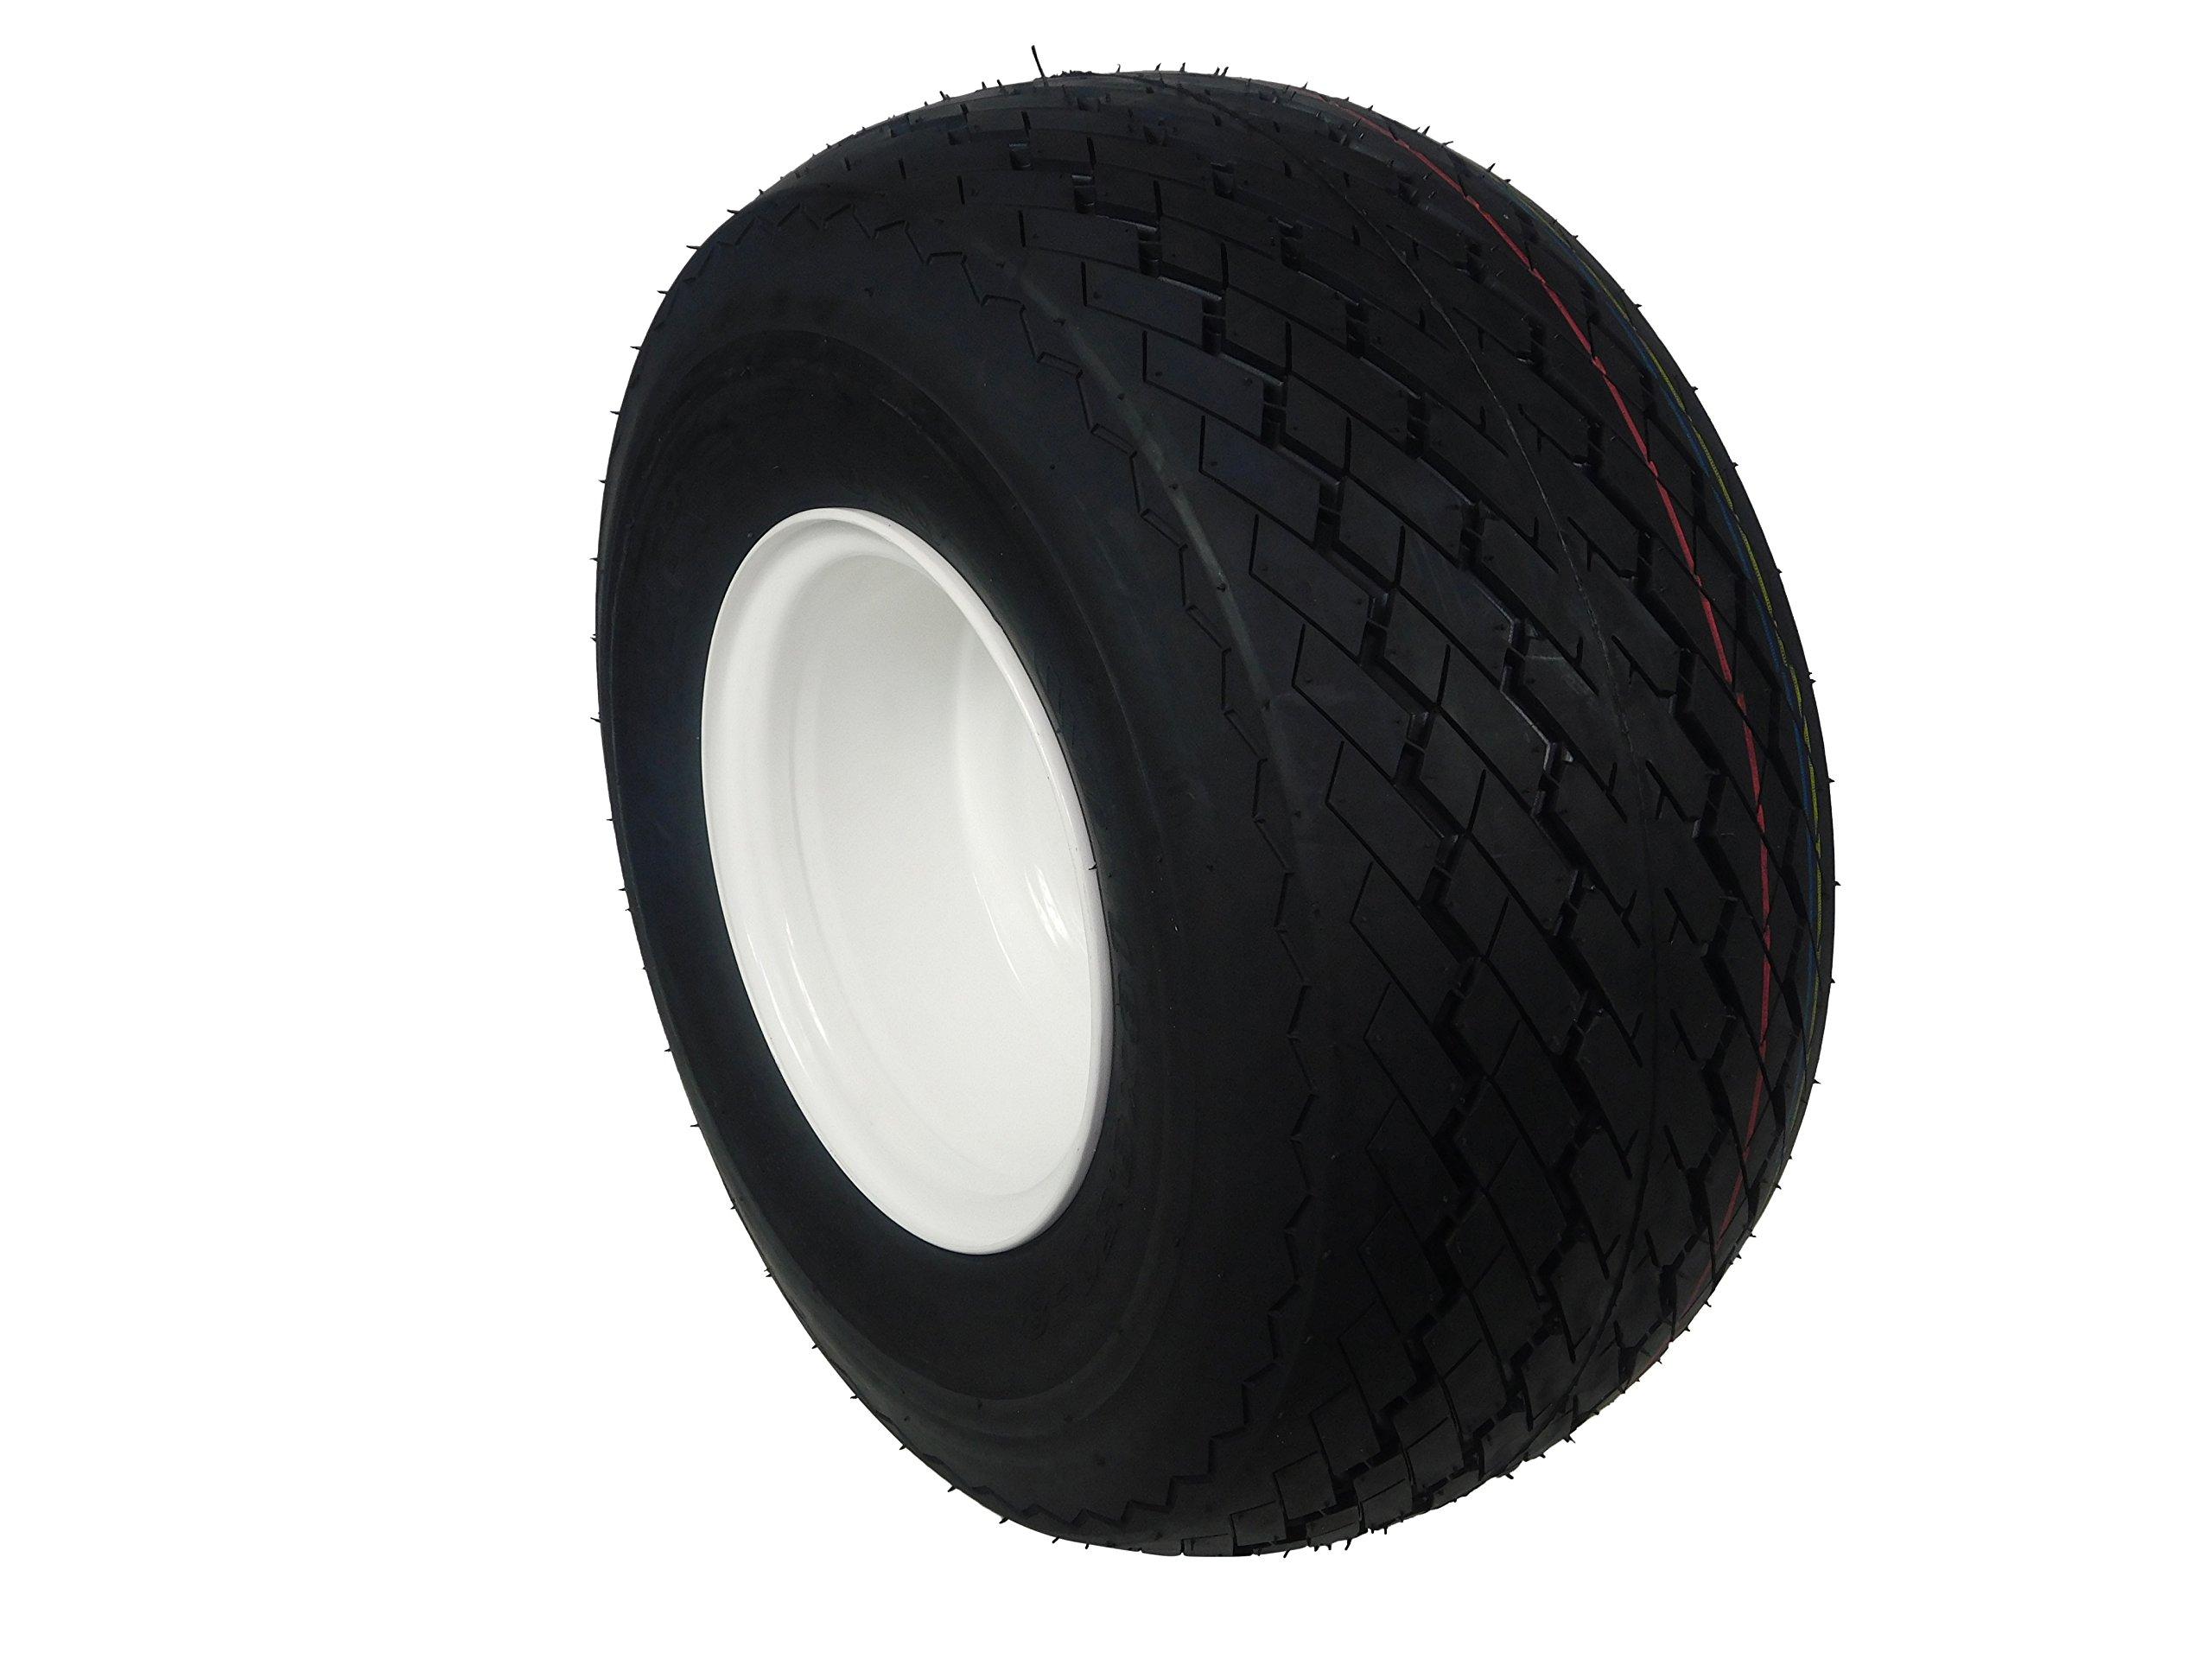 MASSFX SINGLE Golf Cart Tire 18x8.5-8 with White 8x7 4/4 MASSFX Wheel